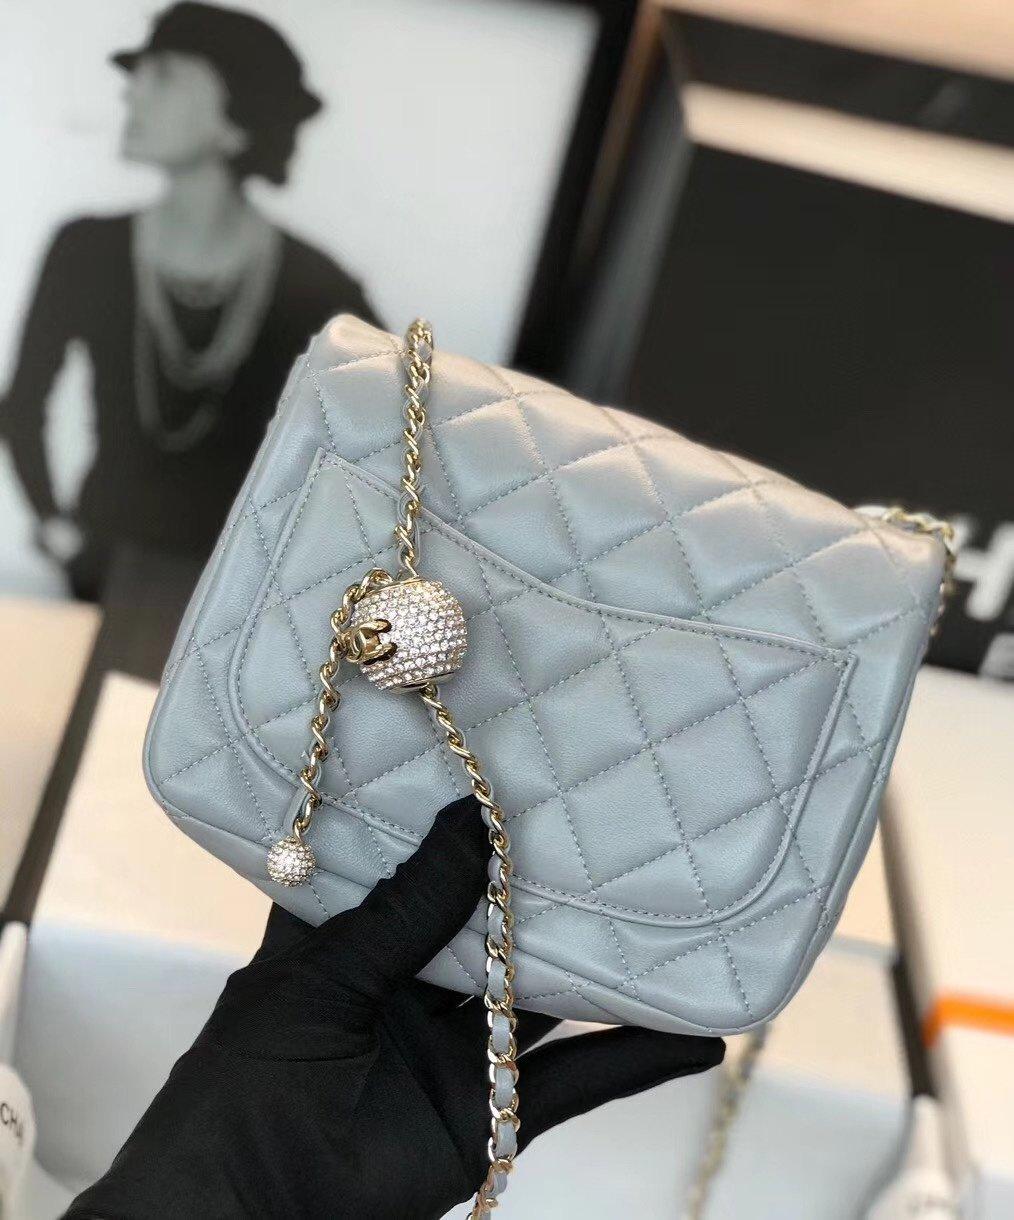 Chanel香奈儿专柜最新钻珠cf款(图3)